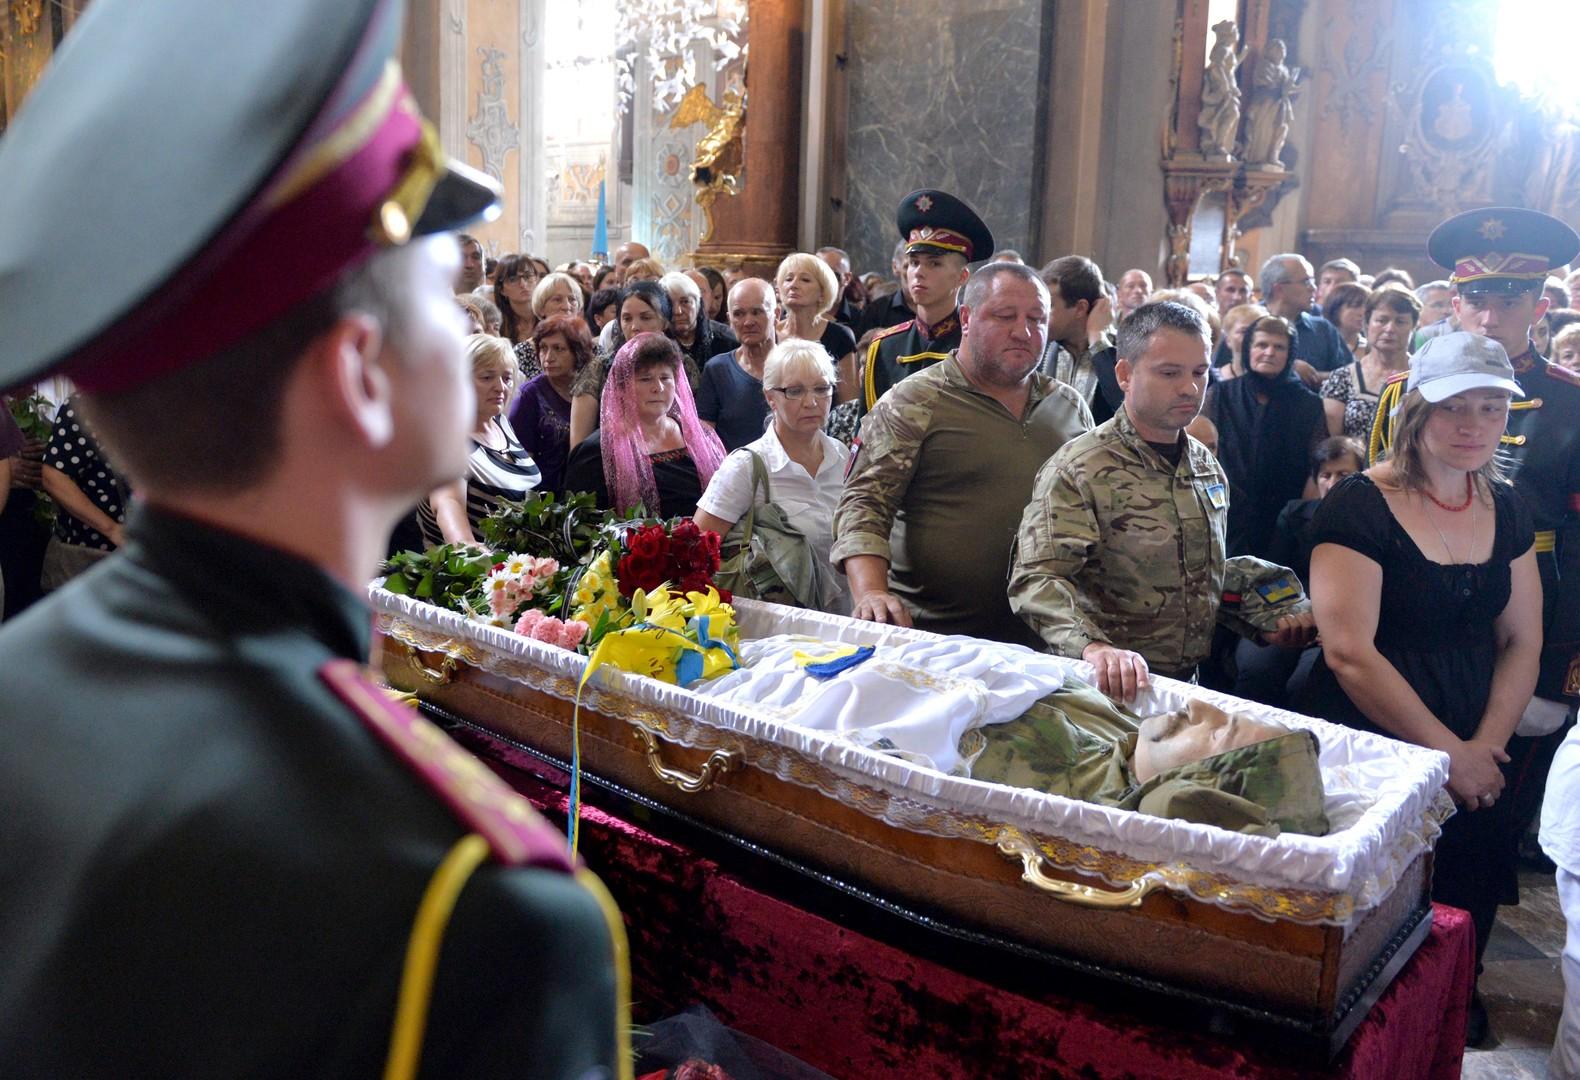 "Wladimir Selenskij huldigt Opernsänger und rechtsradikalen Kämpfer als Opfer ""russischer Aggression"""